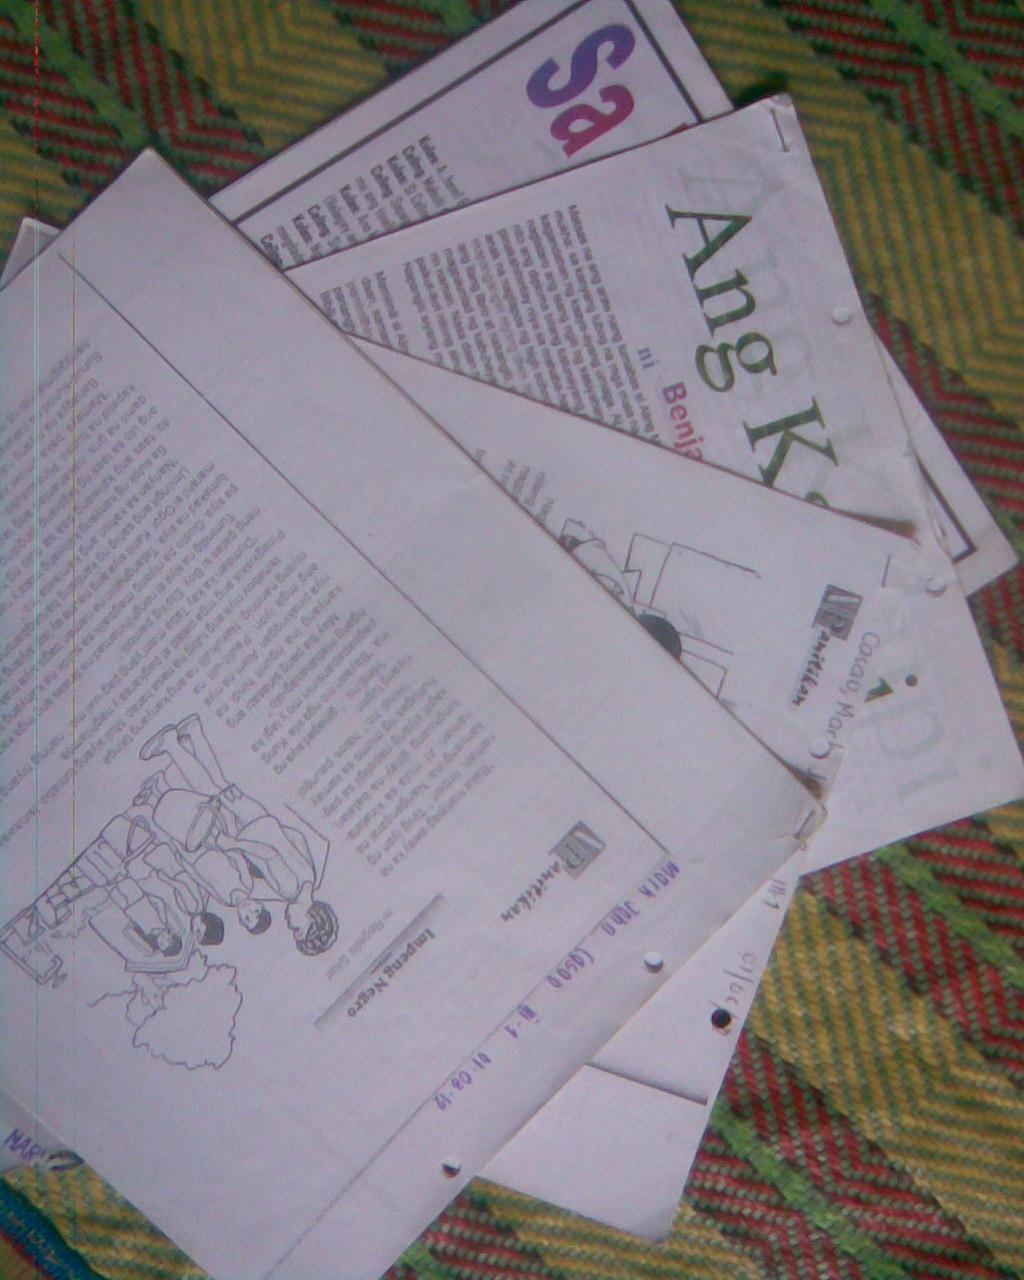 reaksyon papel dekada 70 View essay - dekada 70 reflection paper from is 104 at miriam college diana  joane m gumiran ms valerie buenaventura iii- ba communication section 14 .